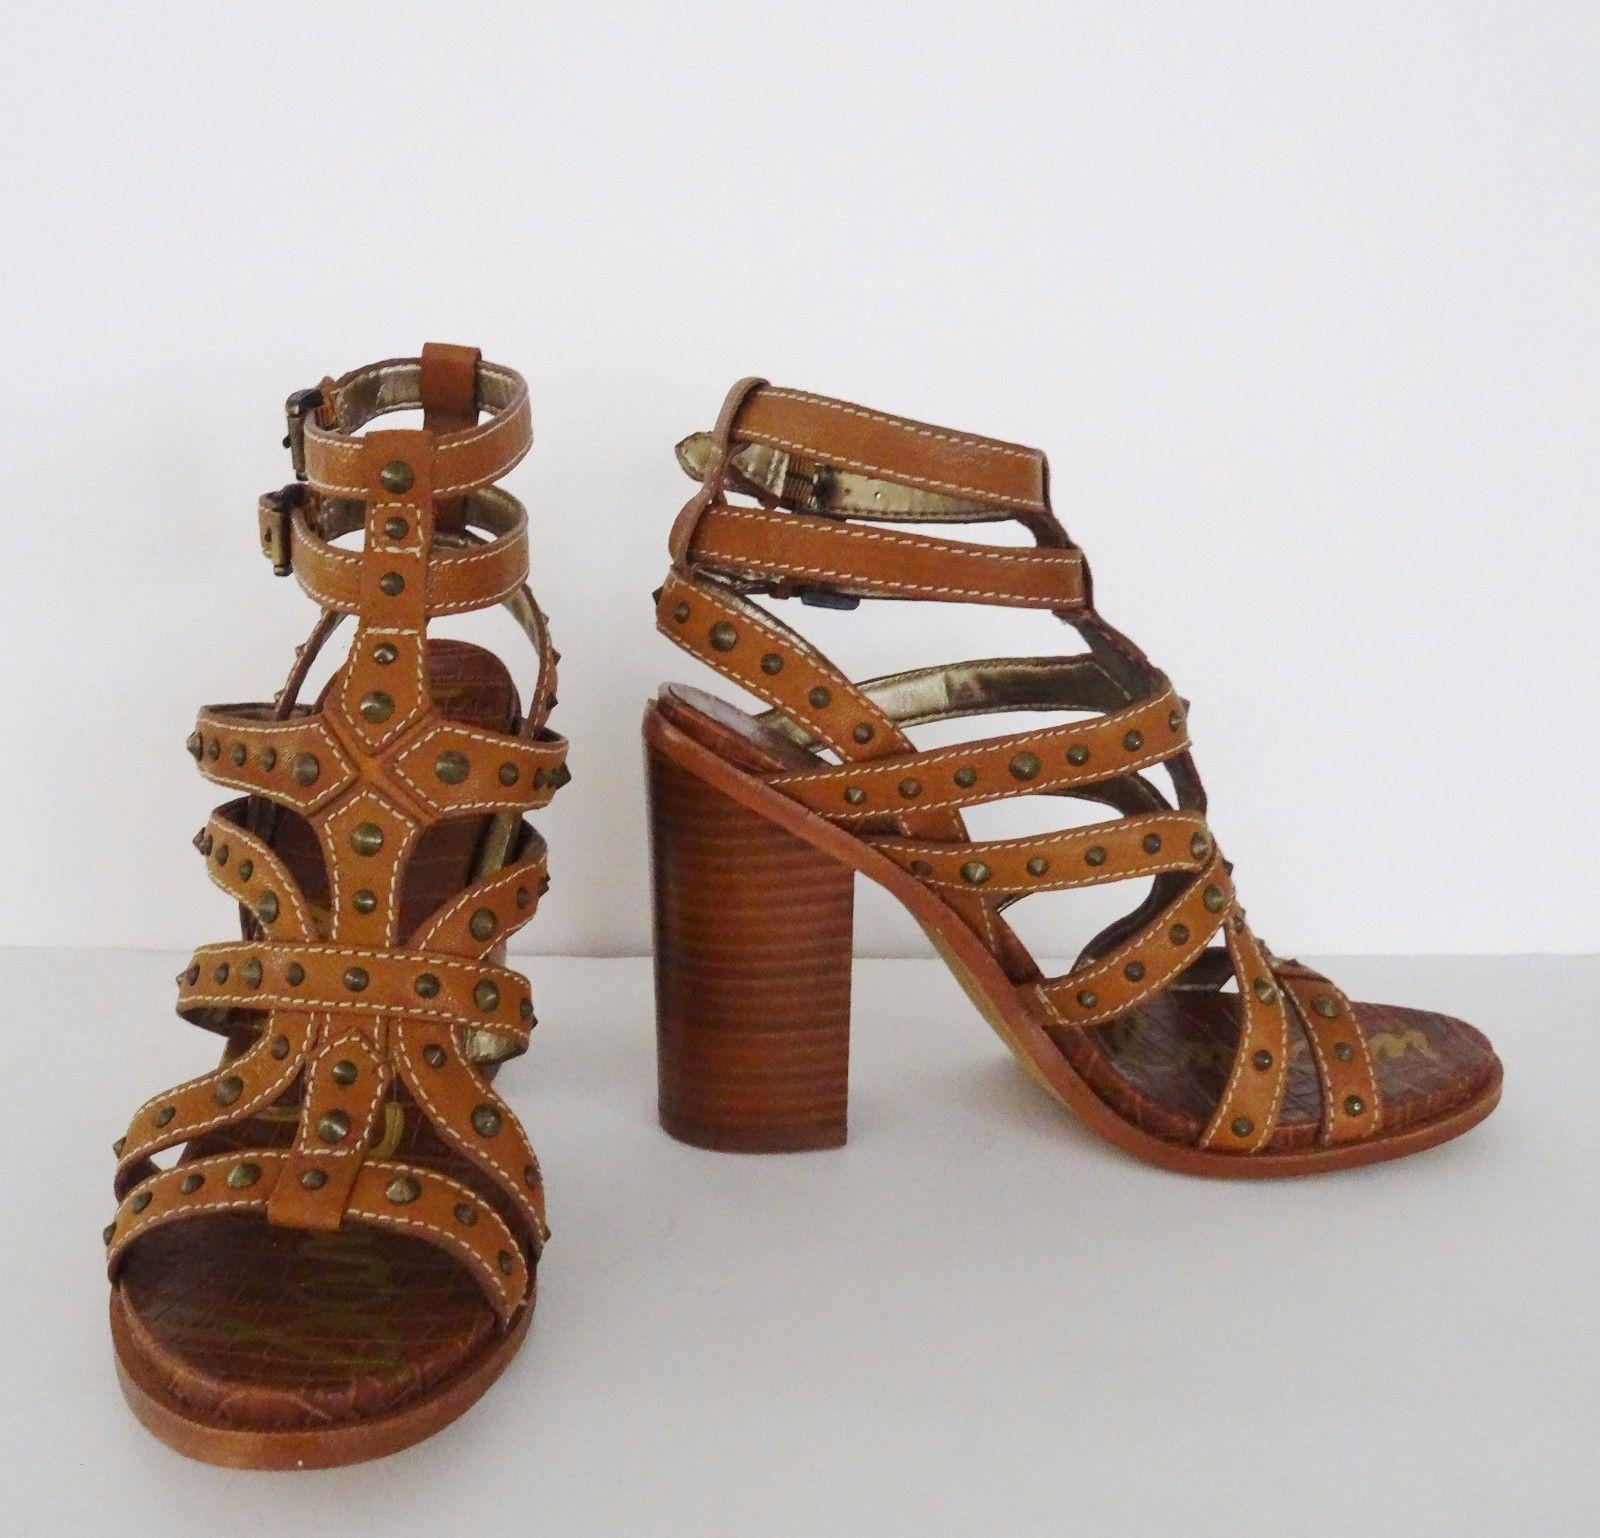 01876a8404f6 NIB Sam Edelman Keith Block Strappy Heels and 50 similar items. 57